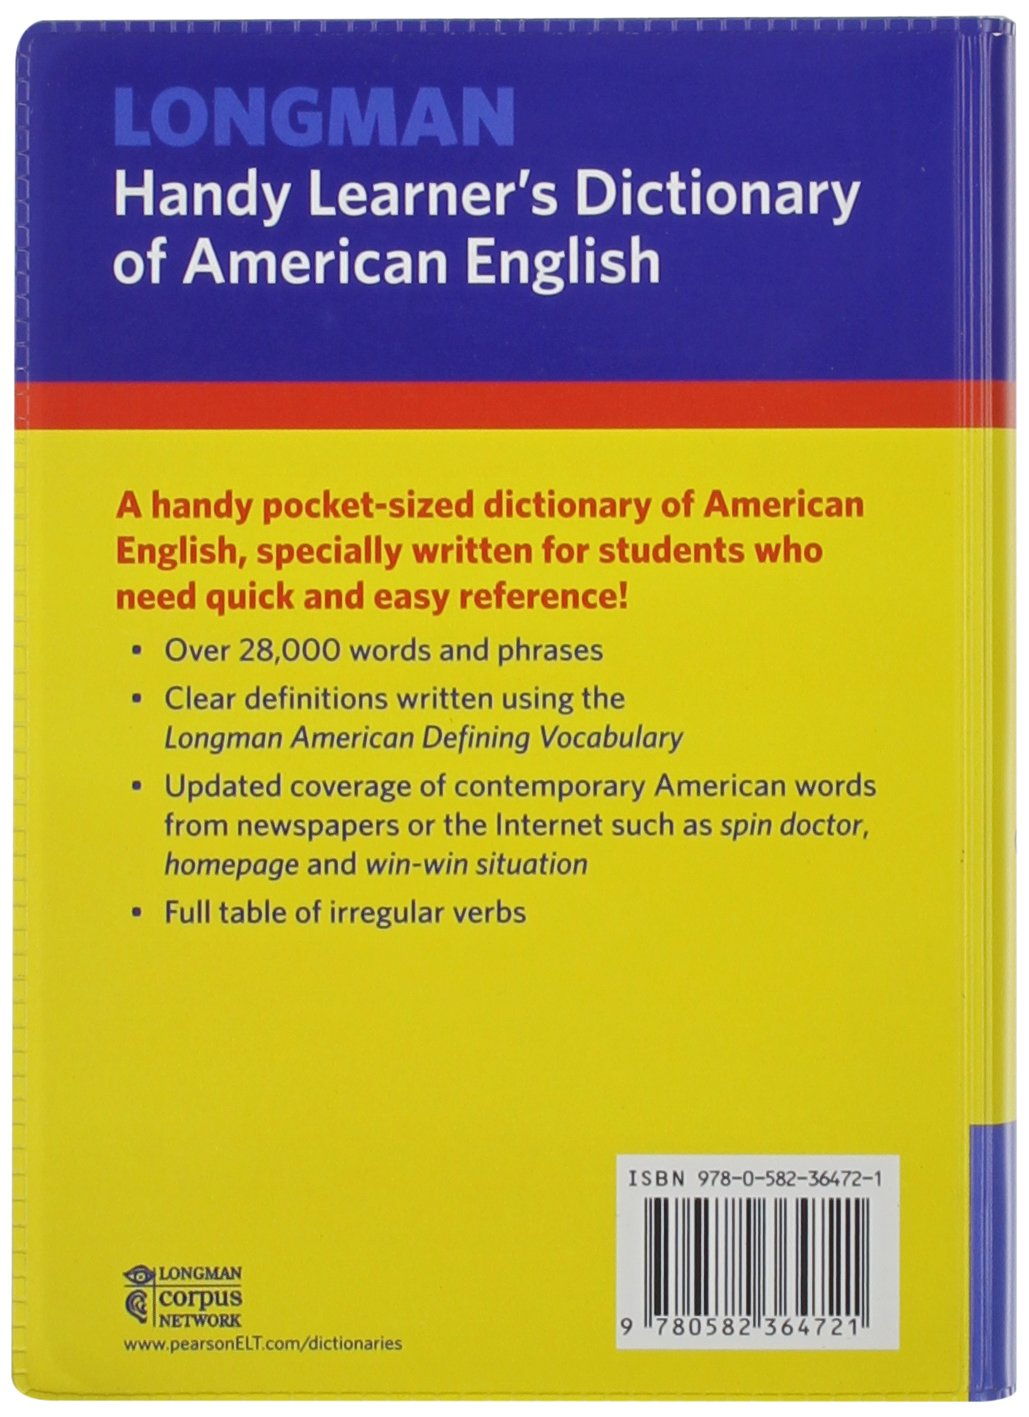 Longman Handy Learner's Dictionary of American English, Flexicover (Lhld):  Pearson Education: 9780582364721: Amazon.com: Books